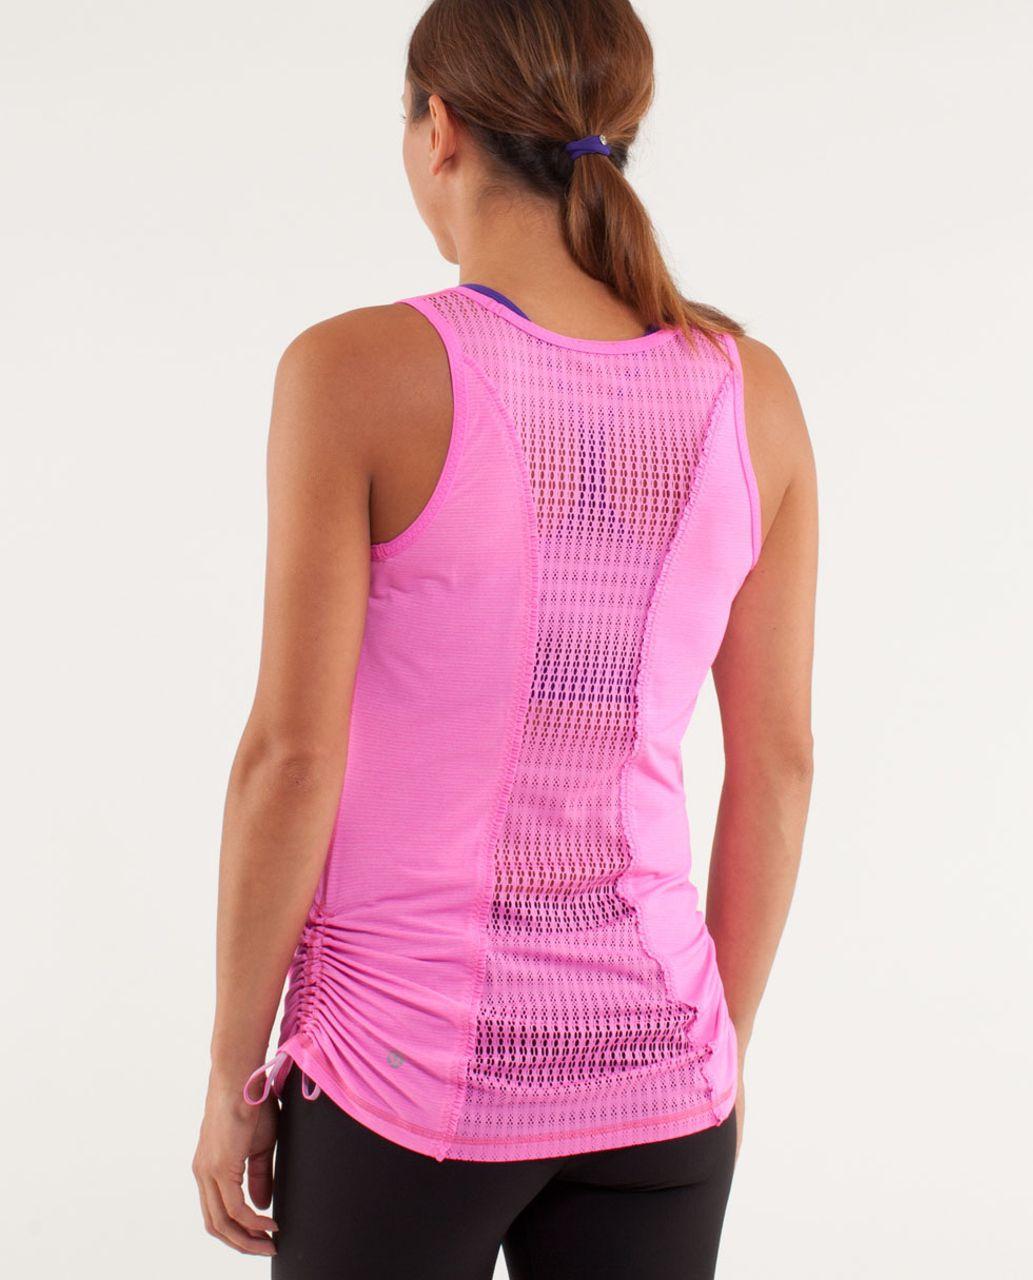 Lululemon Run:  Tie And Fly Tank - Pow Pink Light